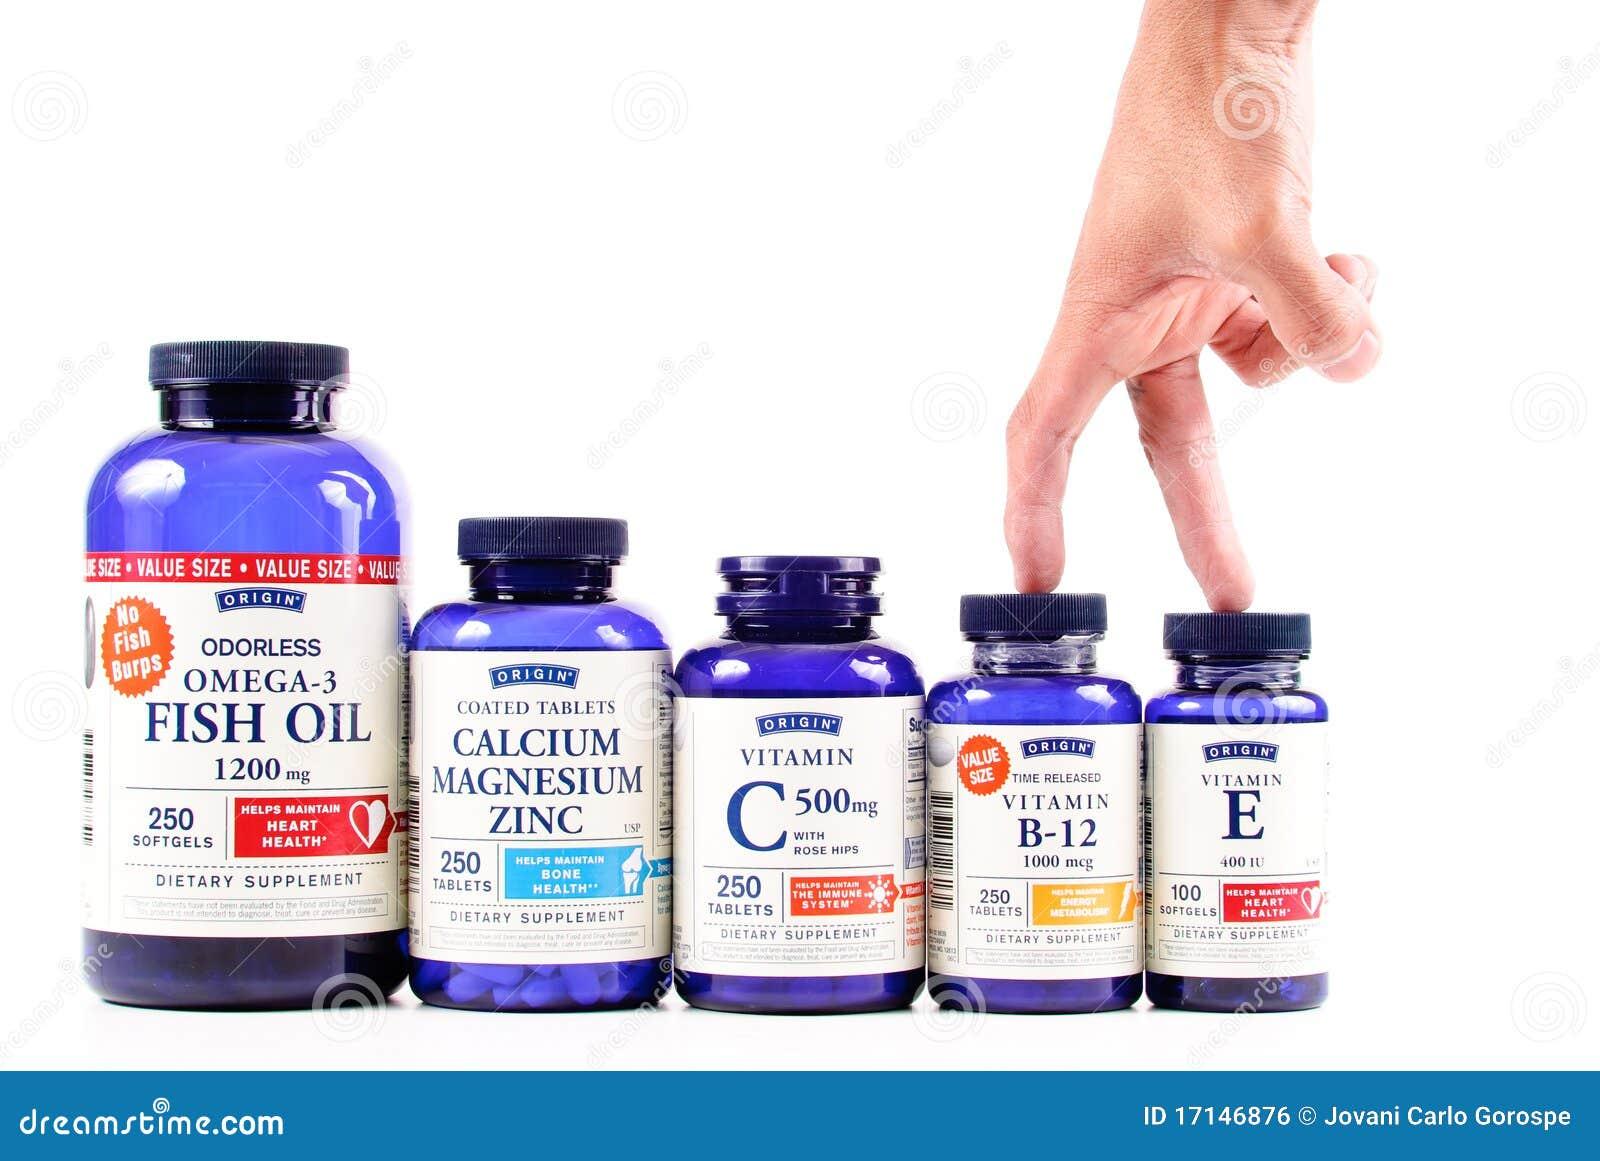 Origin Brand Multi-Purpose Vitamins